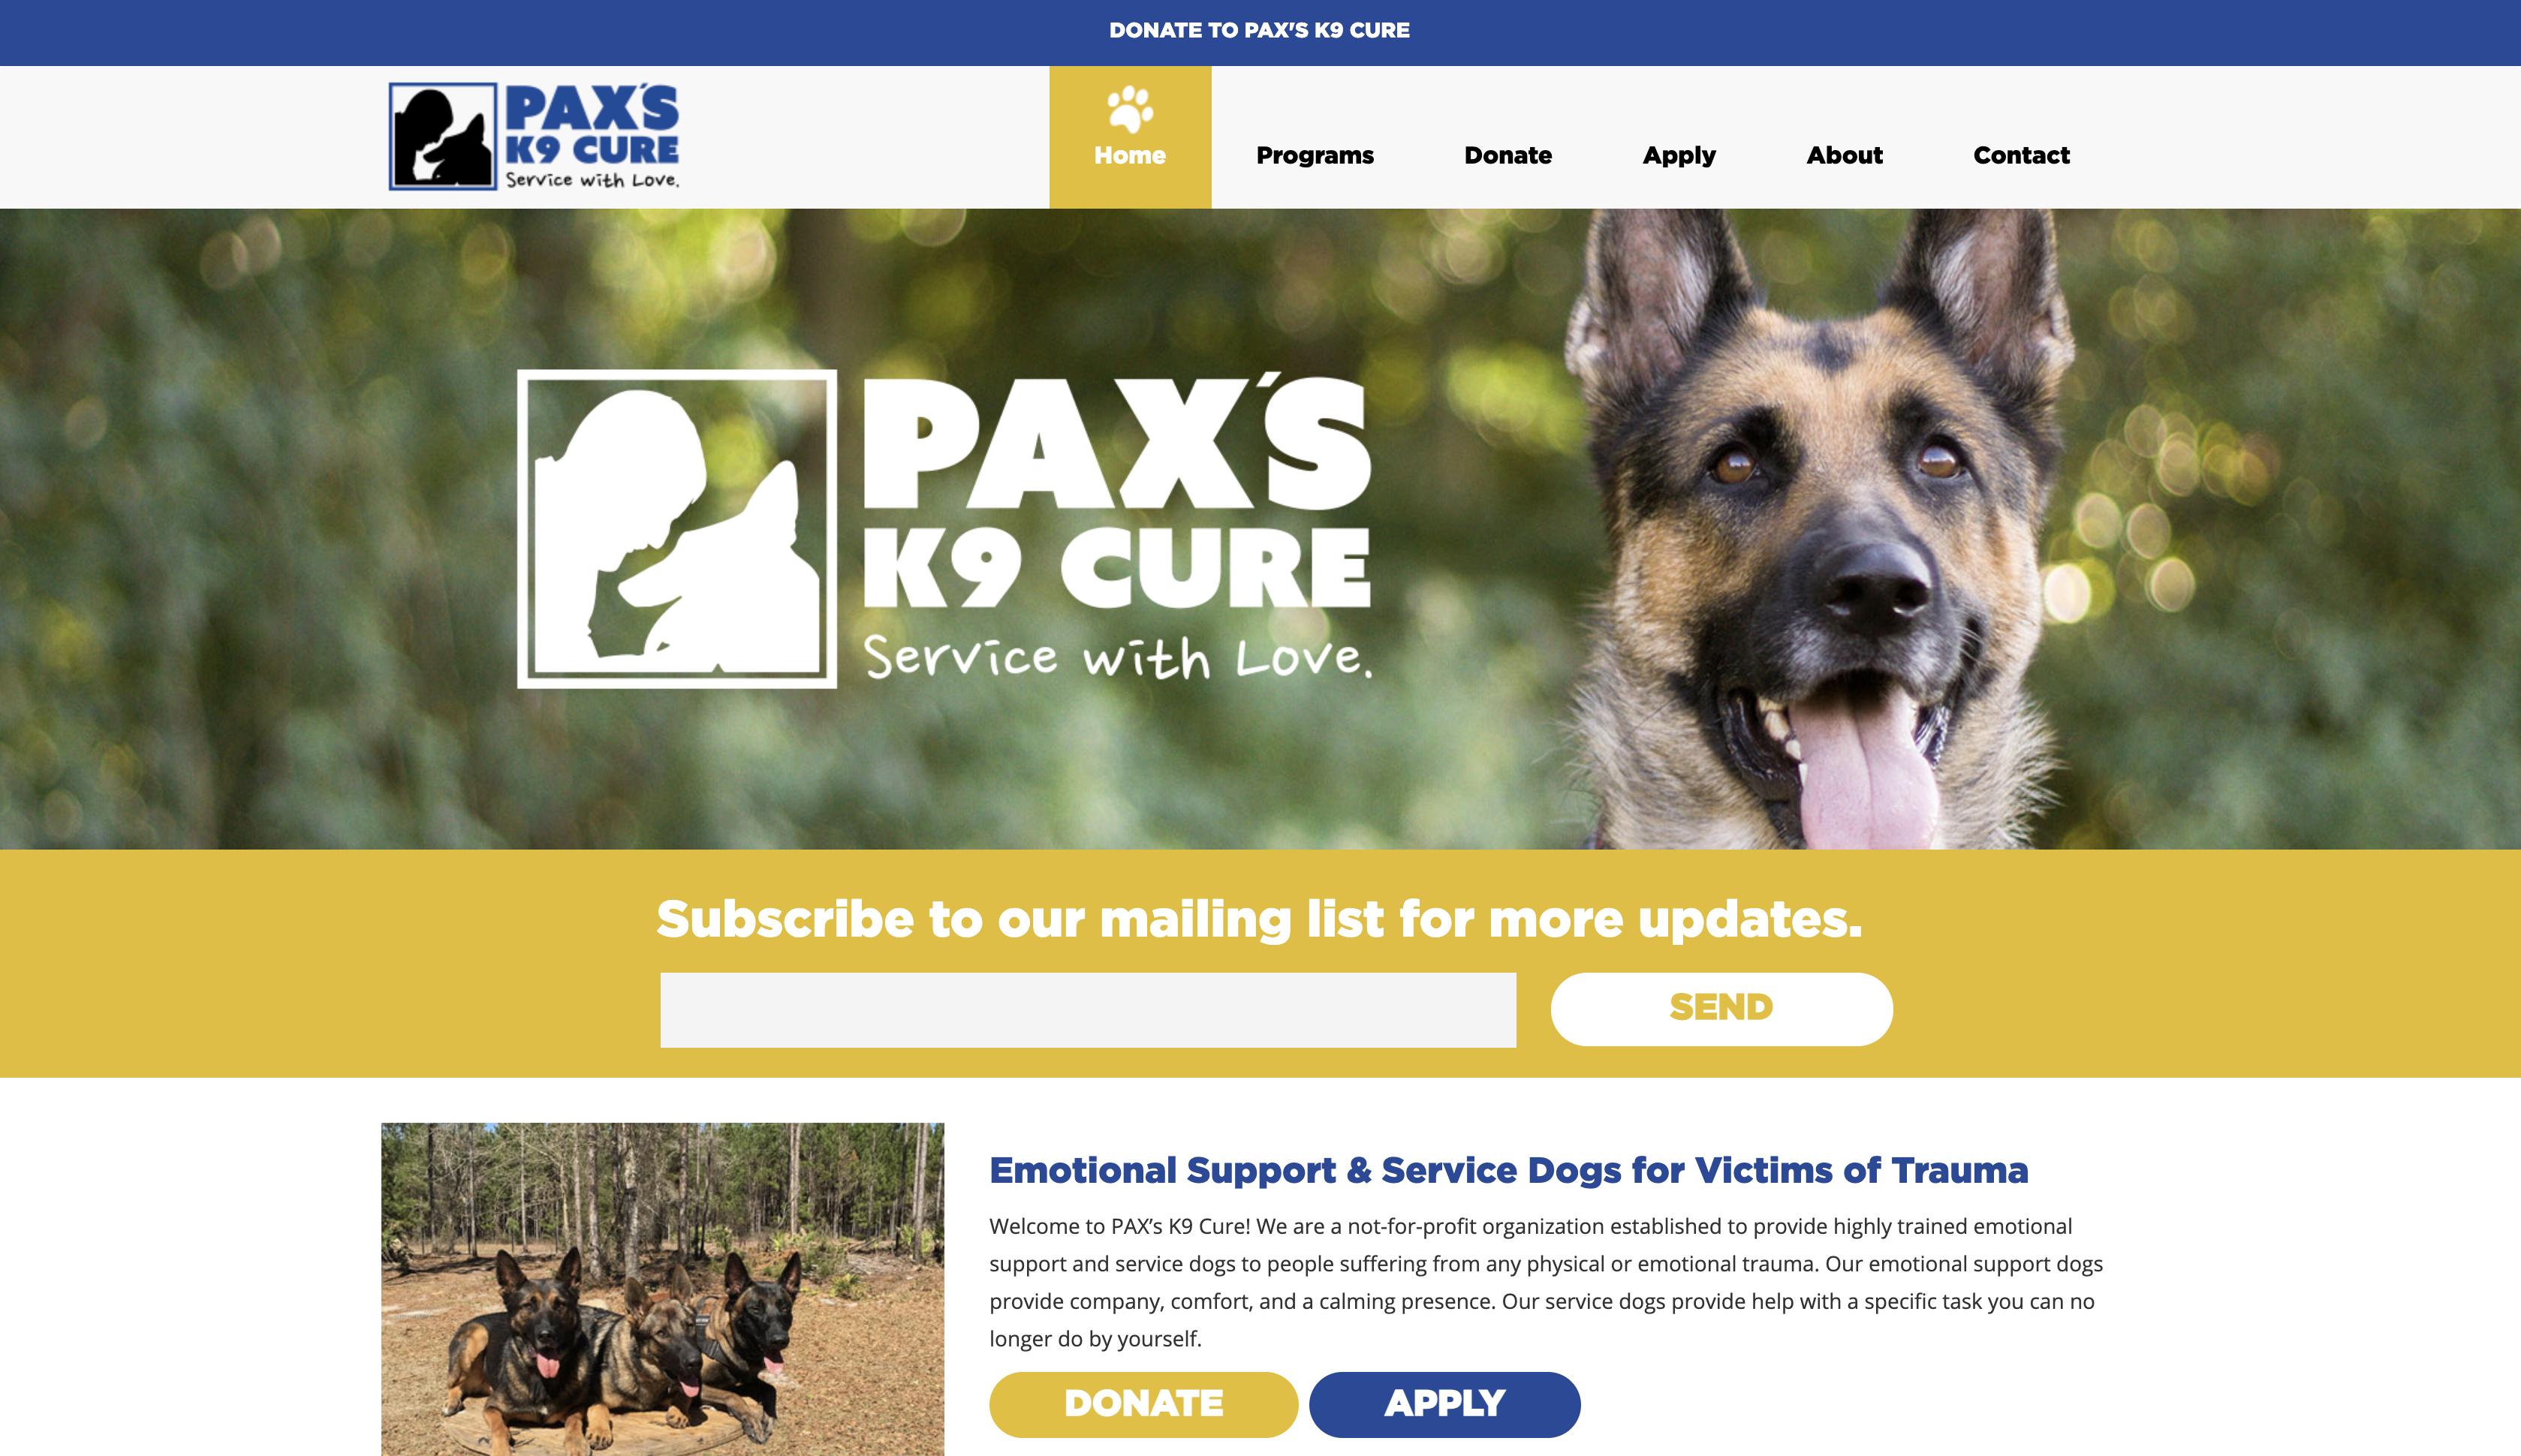 website design jacksonville fl paxs k9 cure